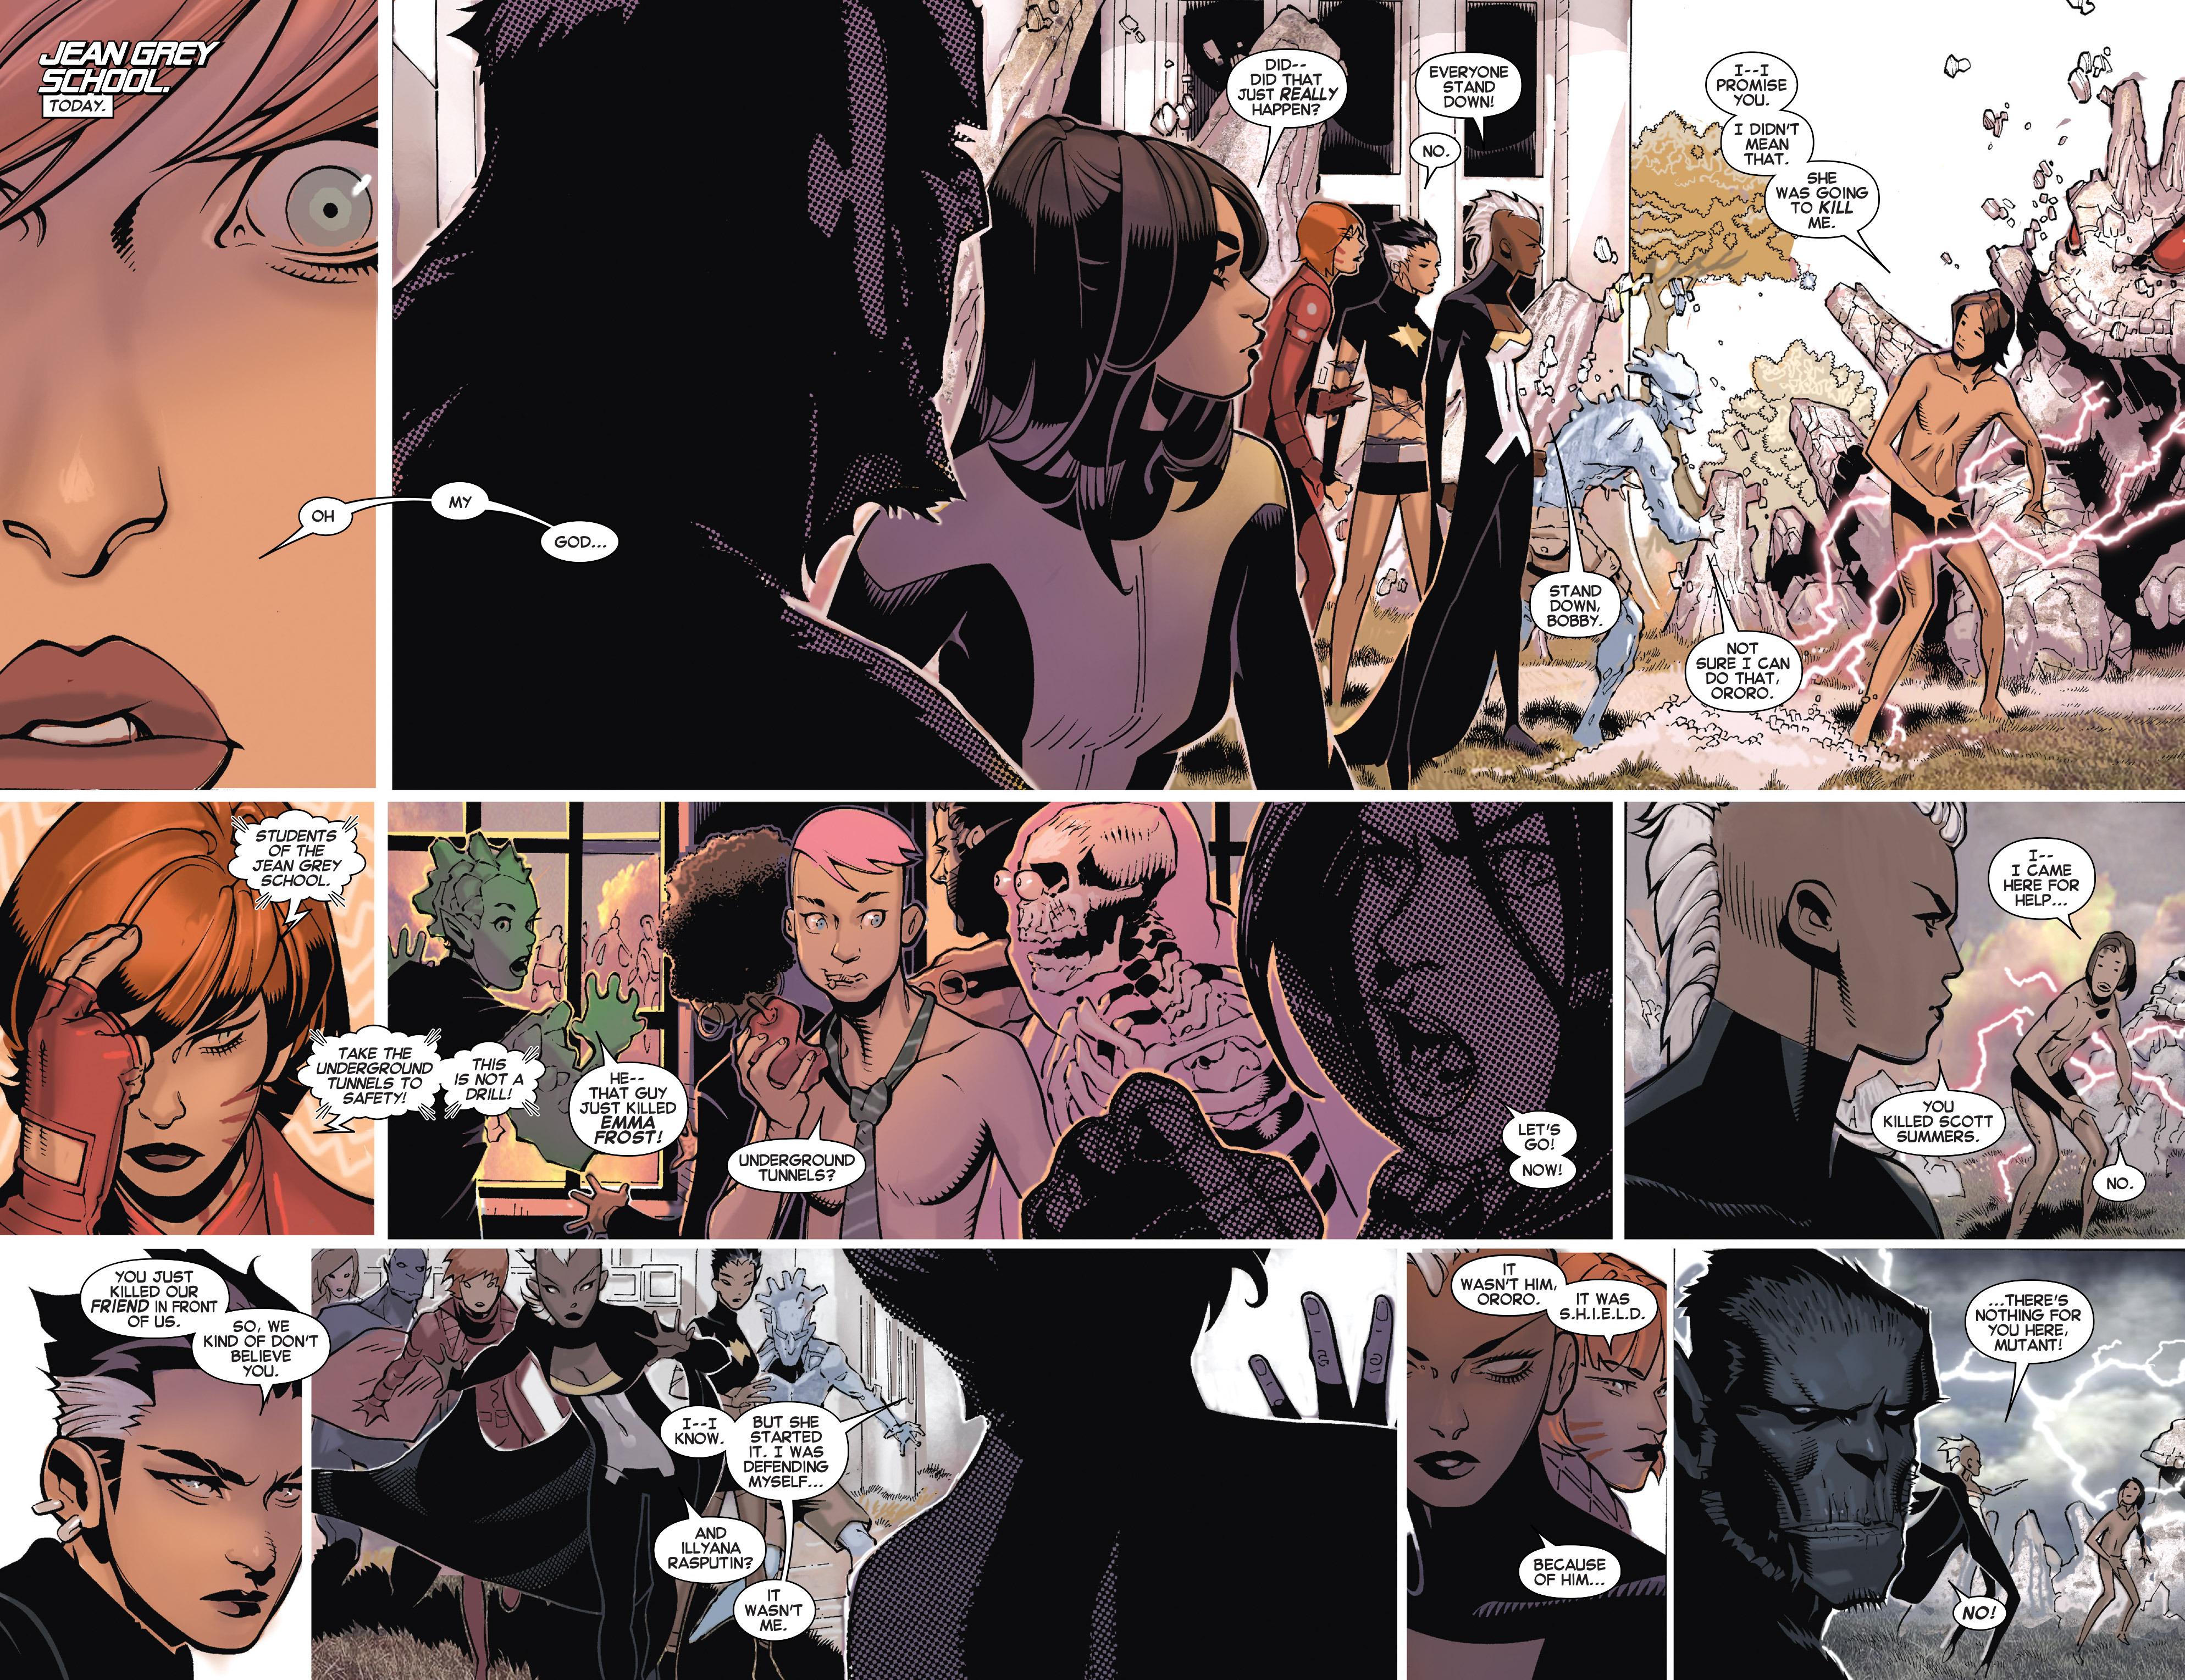 Read online Uncanny X-Men (2013) comic -  Issue # _TPB 5 - The Omega Mutant - 99